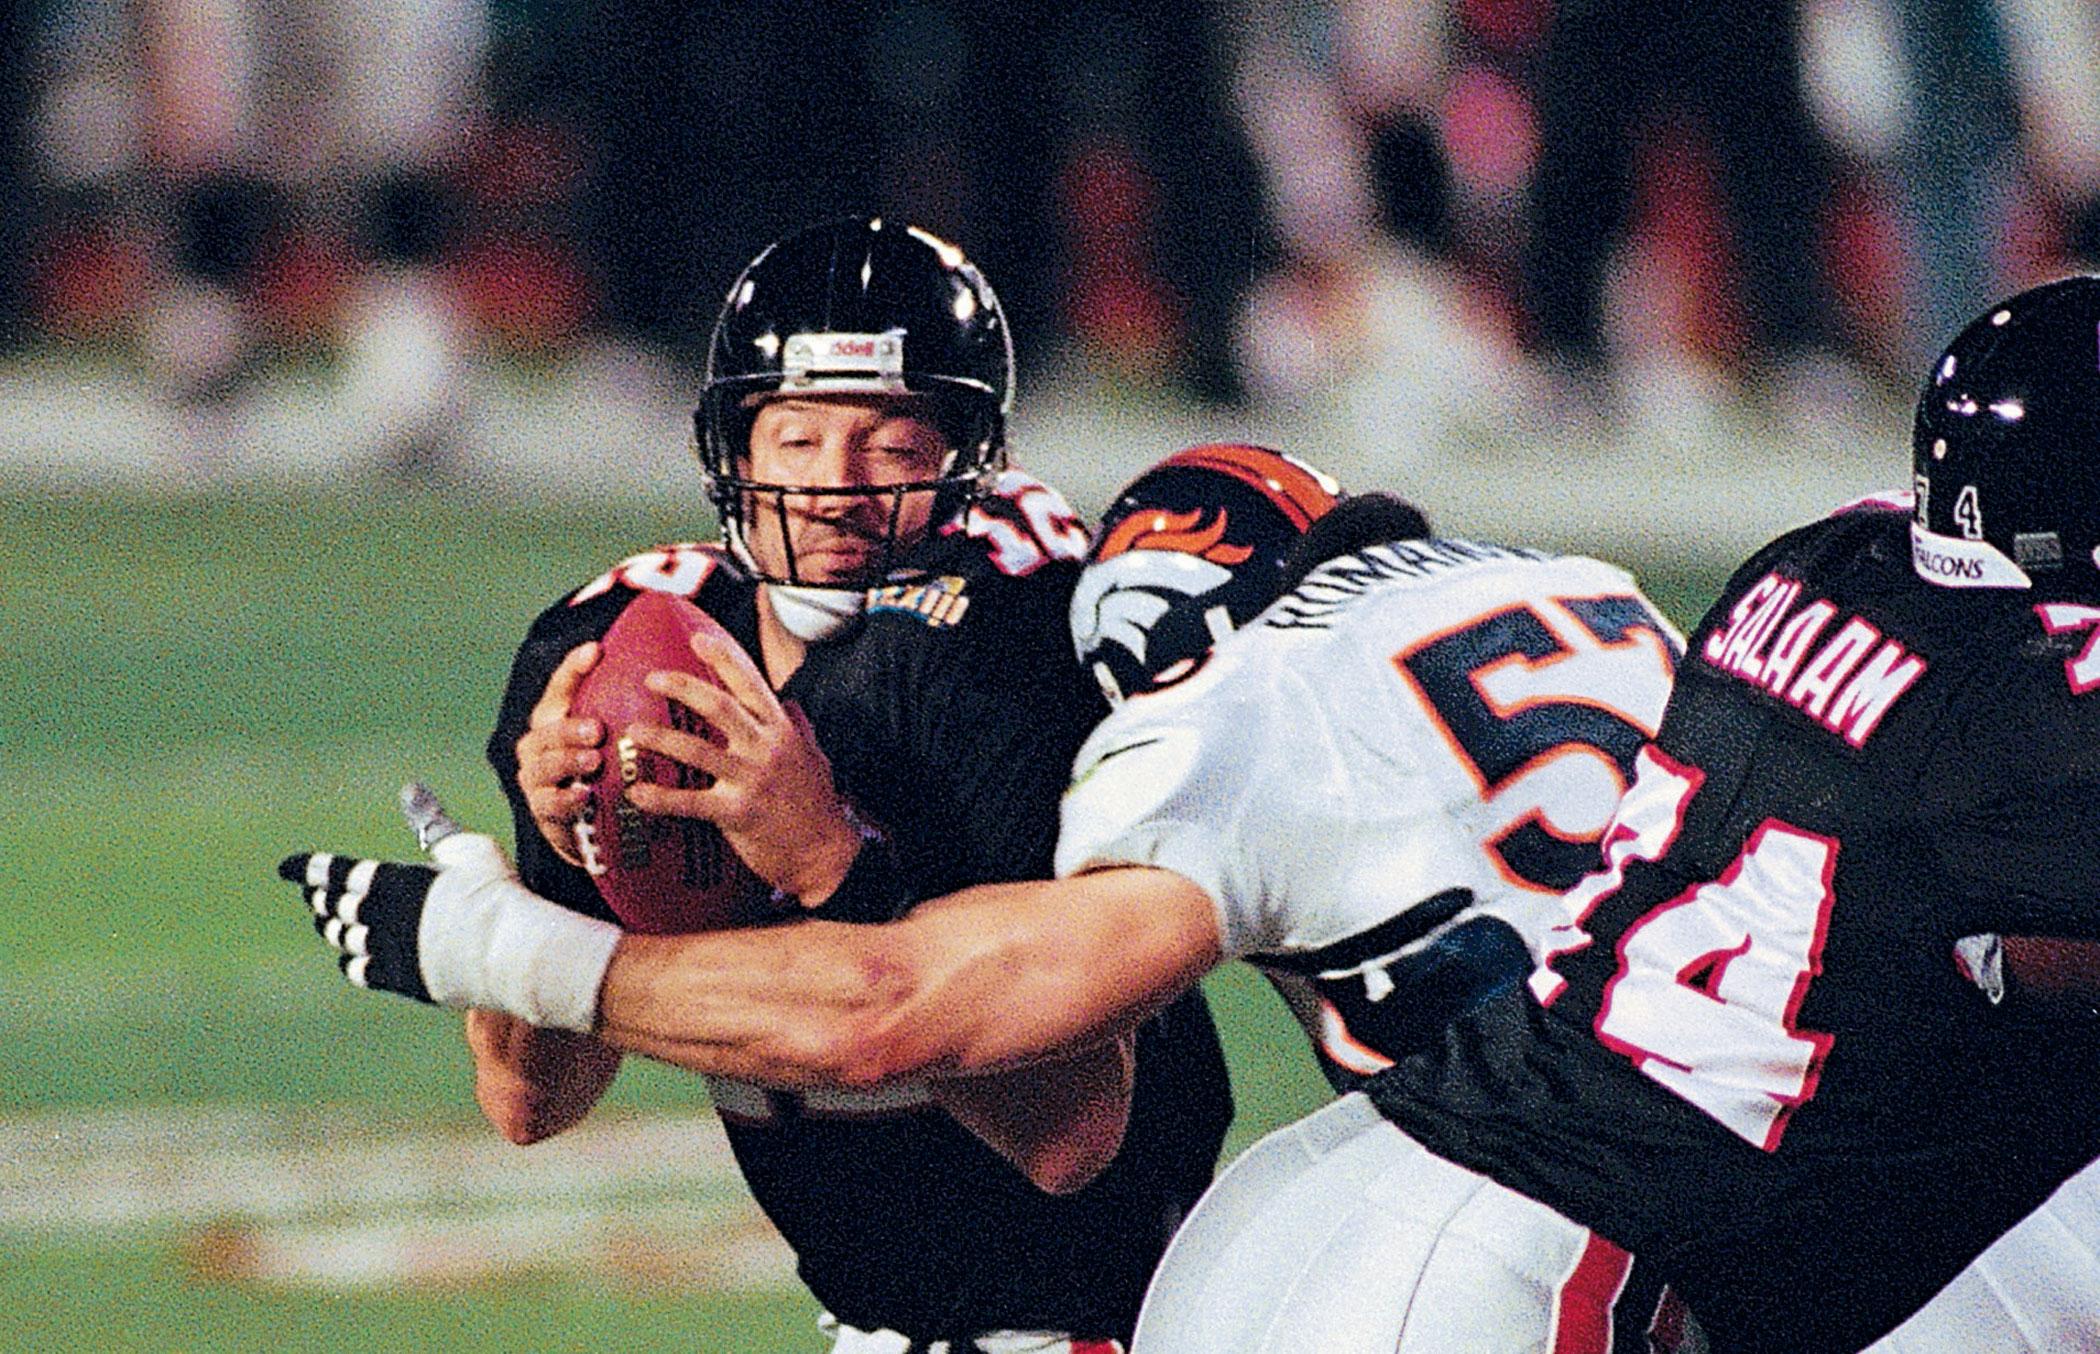 Super Bowl XXXIII, Jan, 31, 1999                               Denver Broncos vs Atlanta Falcons in Miami